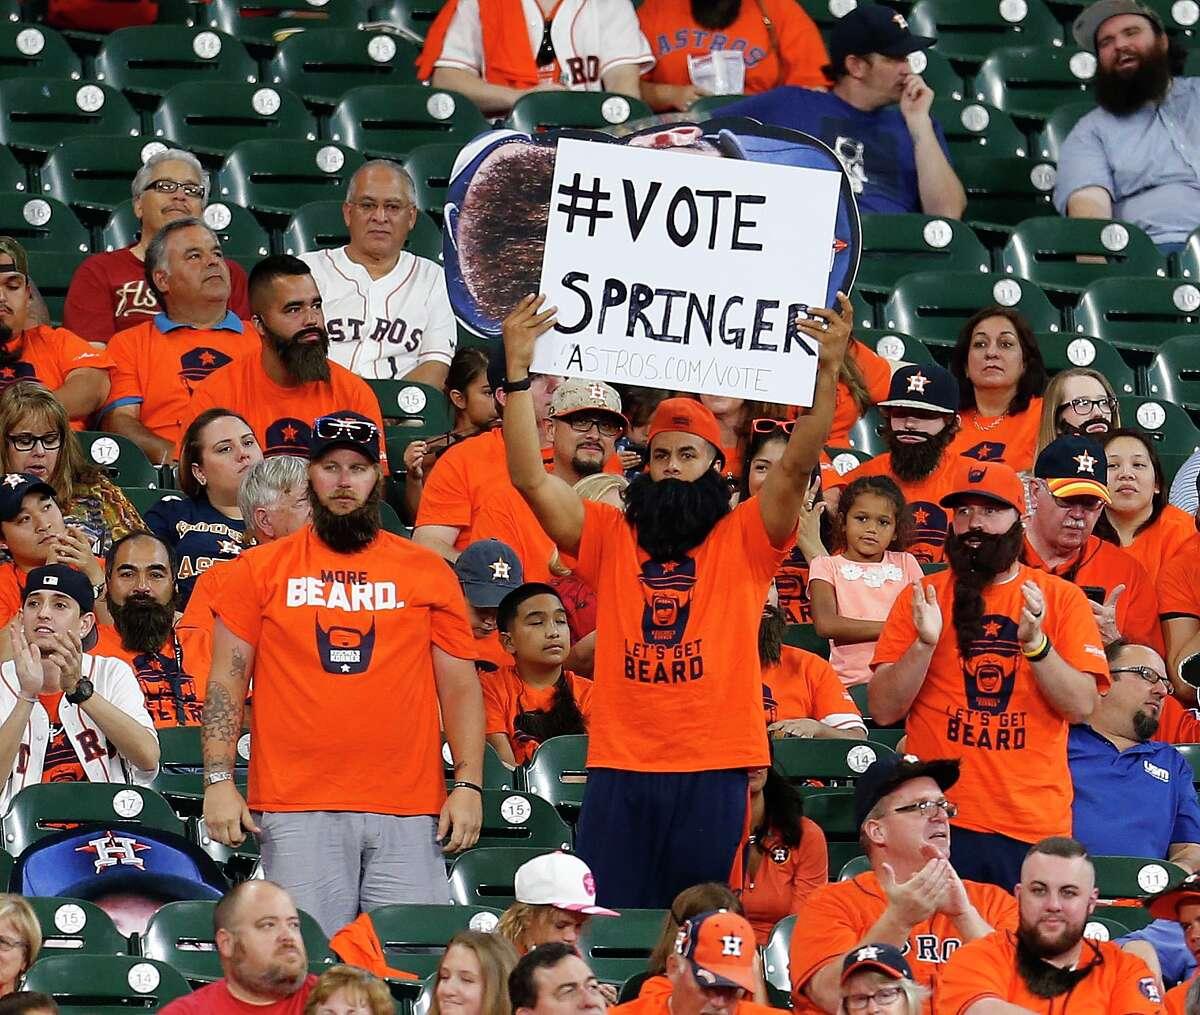 Houston Astros right fielder George Springer fans in the Keuchel Korner hold a sign for him during the third inning of an MLB baseball game at Minute Maid Park, Sunday, July 3, 2016, in Houston. ( Karen Warren / Houston Chronicle )